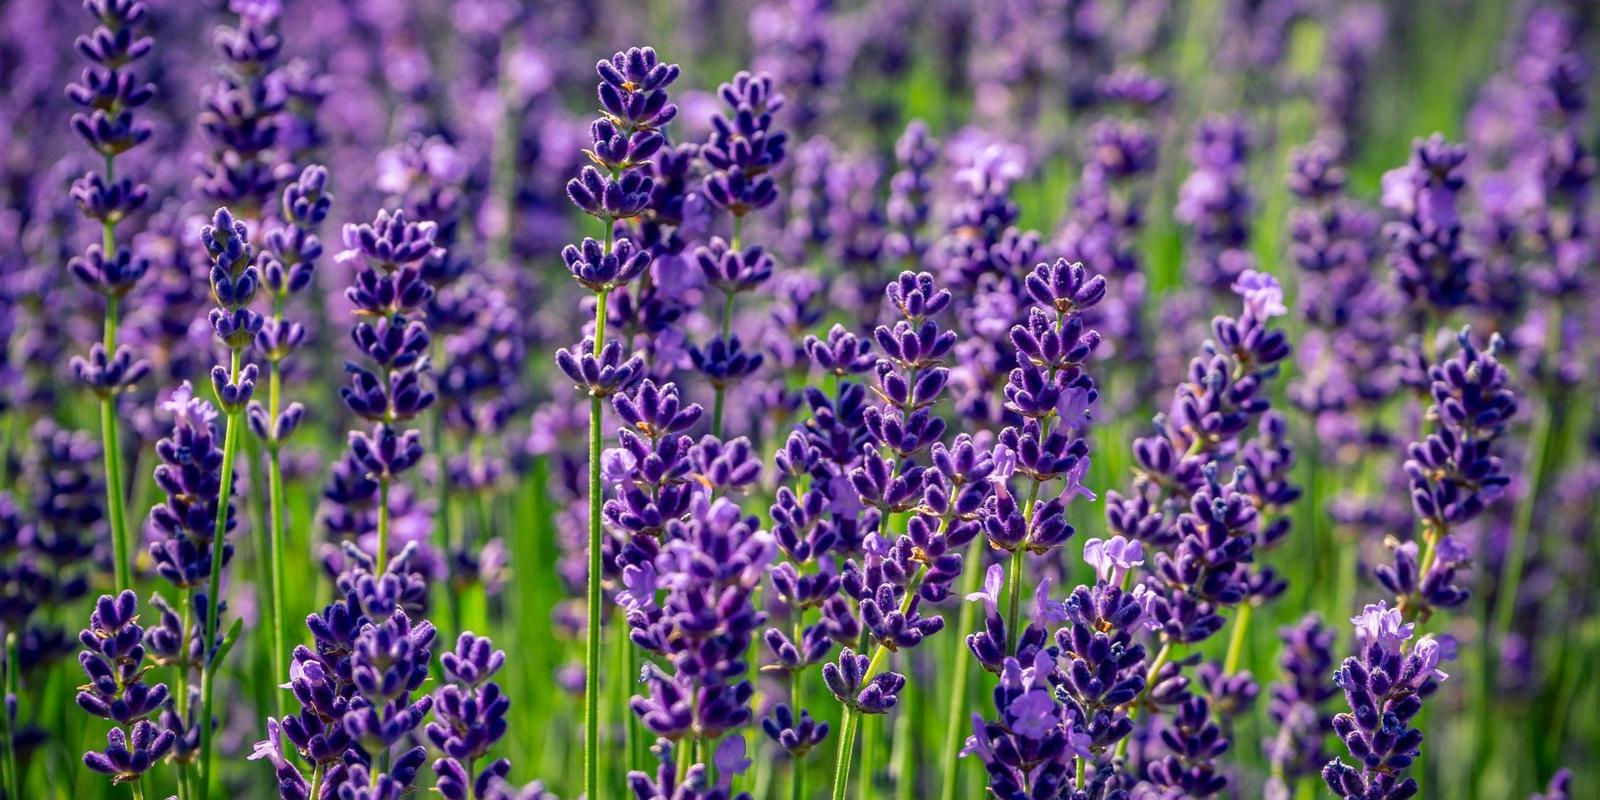 Lavendel knippen